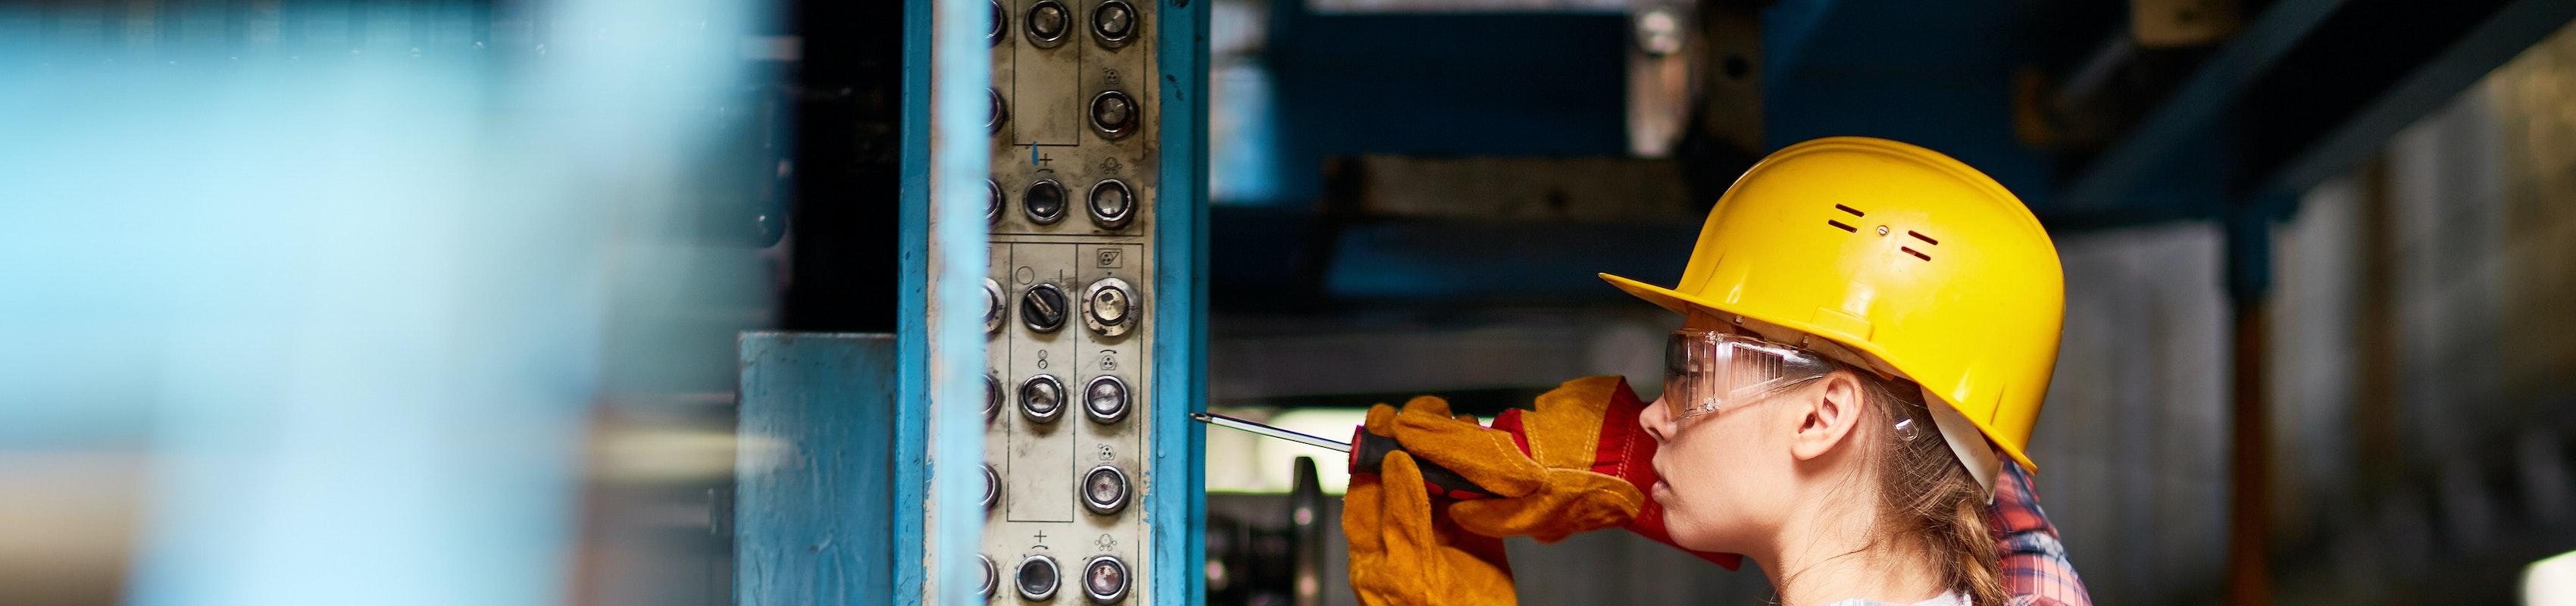 Industri & Teknik